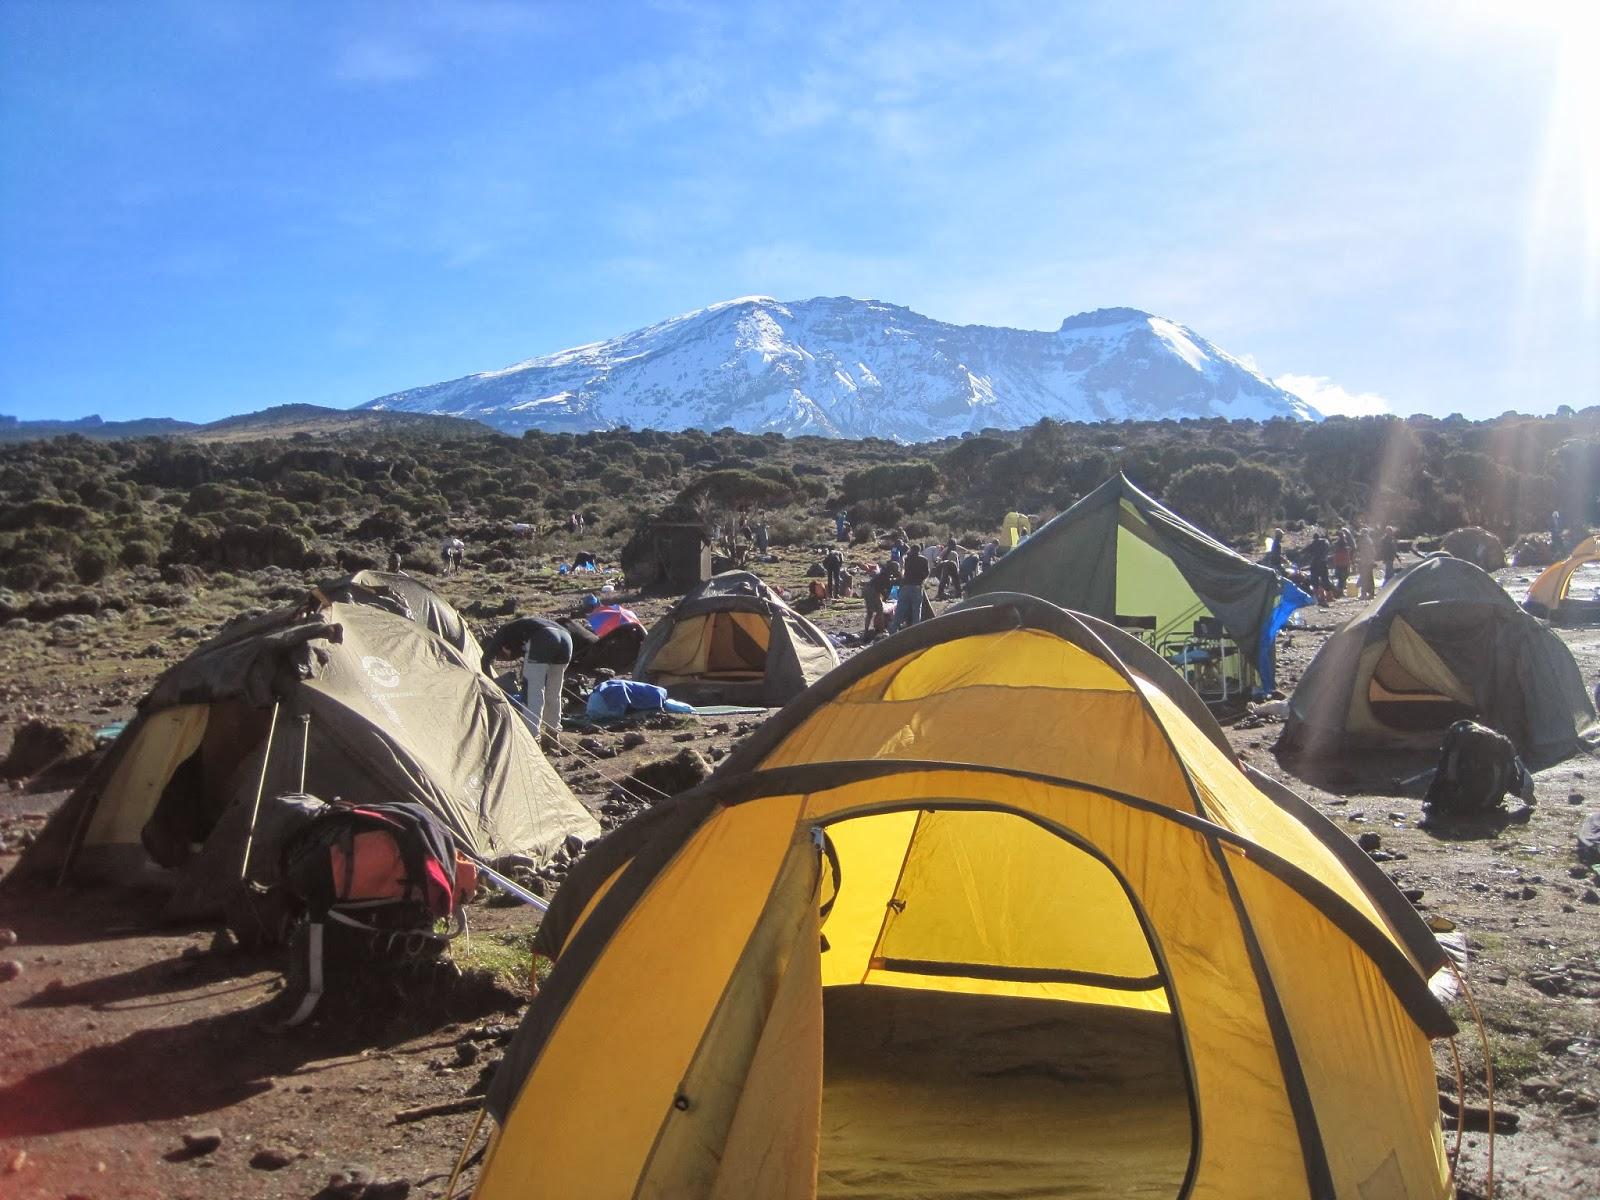 ENLACIMA-Amanecer-en-Shira-Hut-Kilimanajro-Ruta-Machame